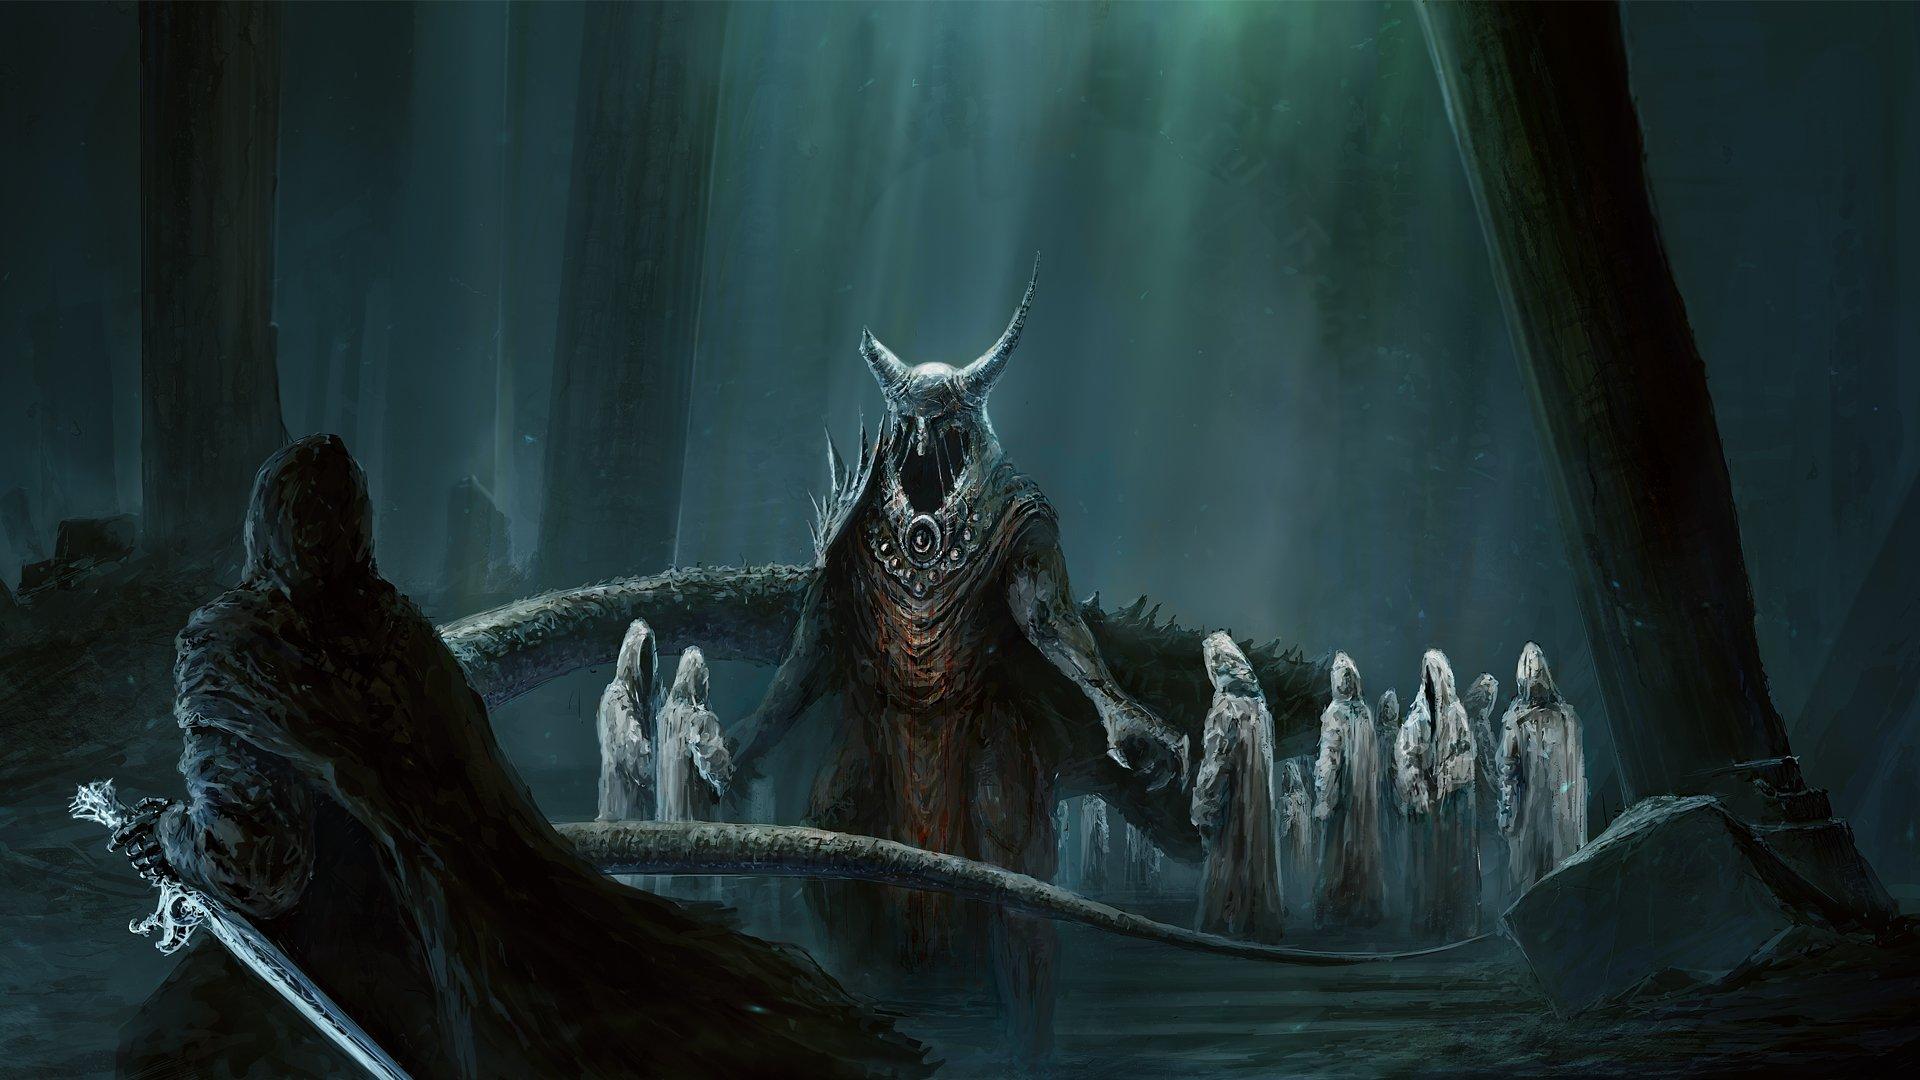 Downaload Overlord King And Warriors Art Wallpaper: Undead Underworld Lord Dark Demon Warrior Fantasy Occult